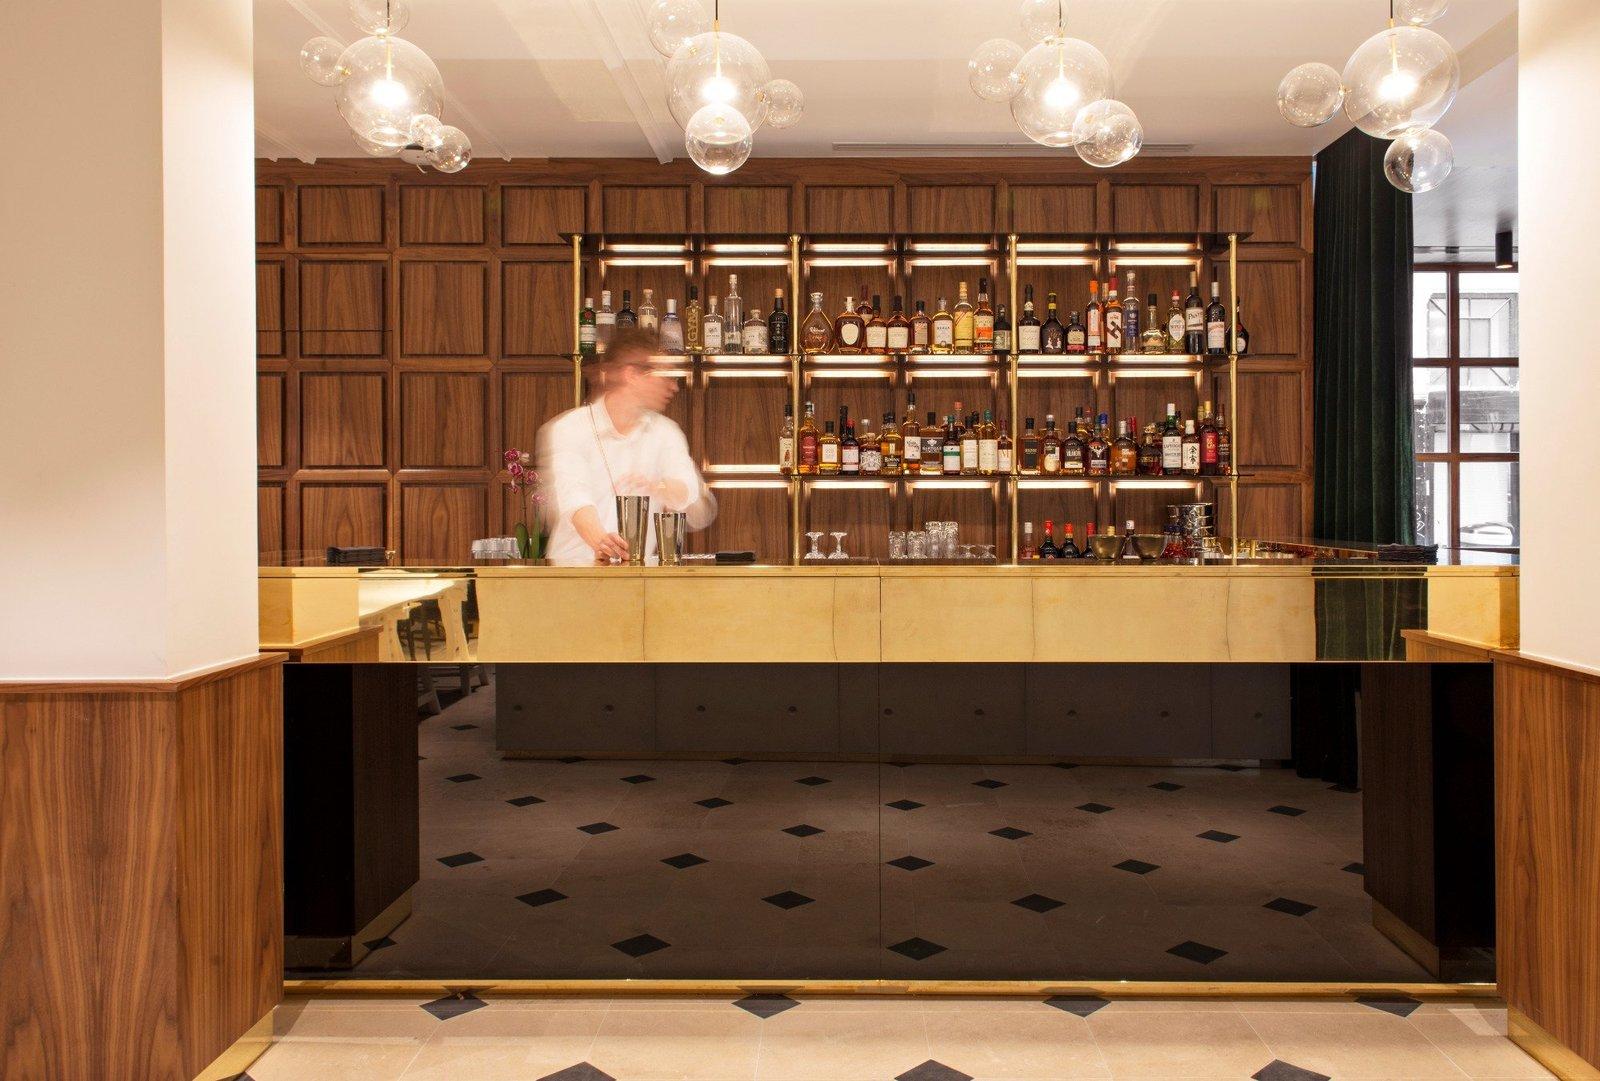 Dining Room, Pendant Lighting, and Bar  Hôtel Parister